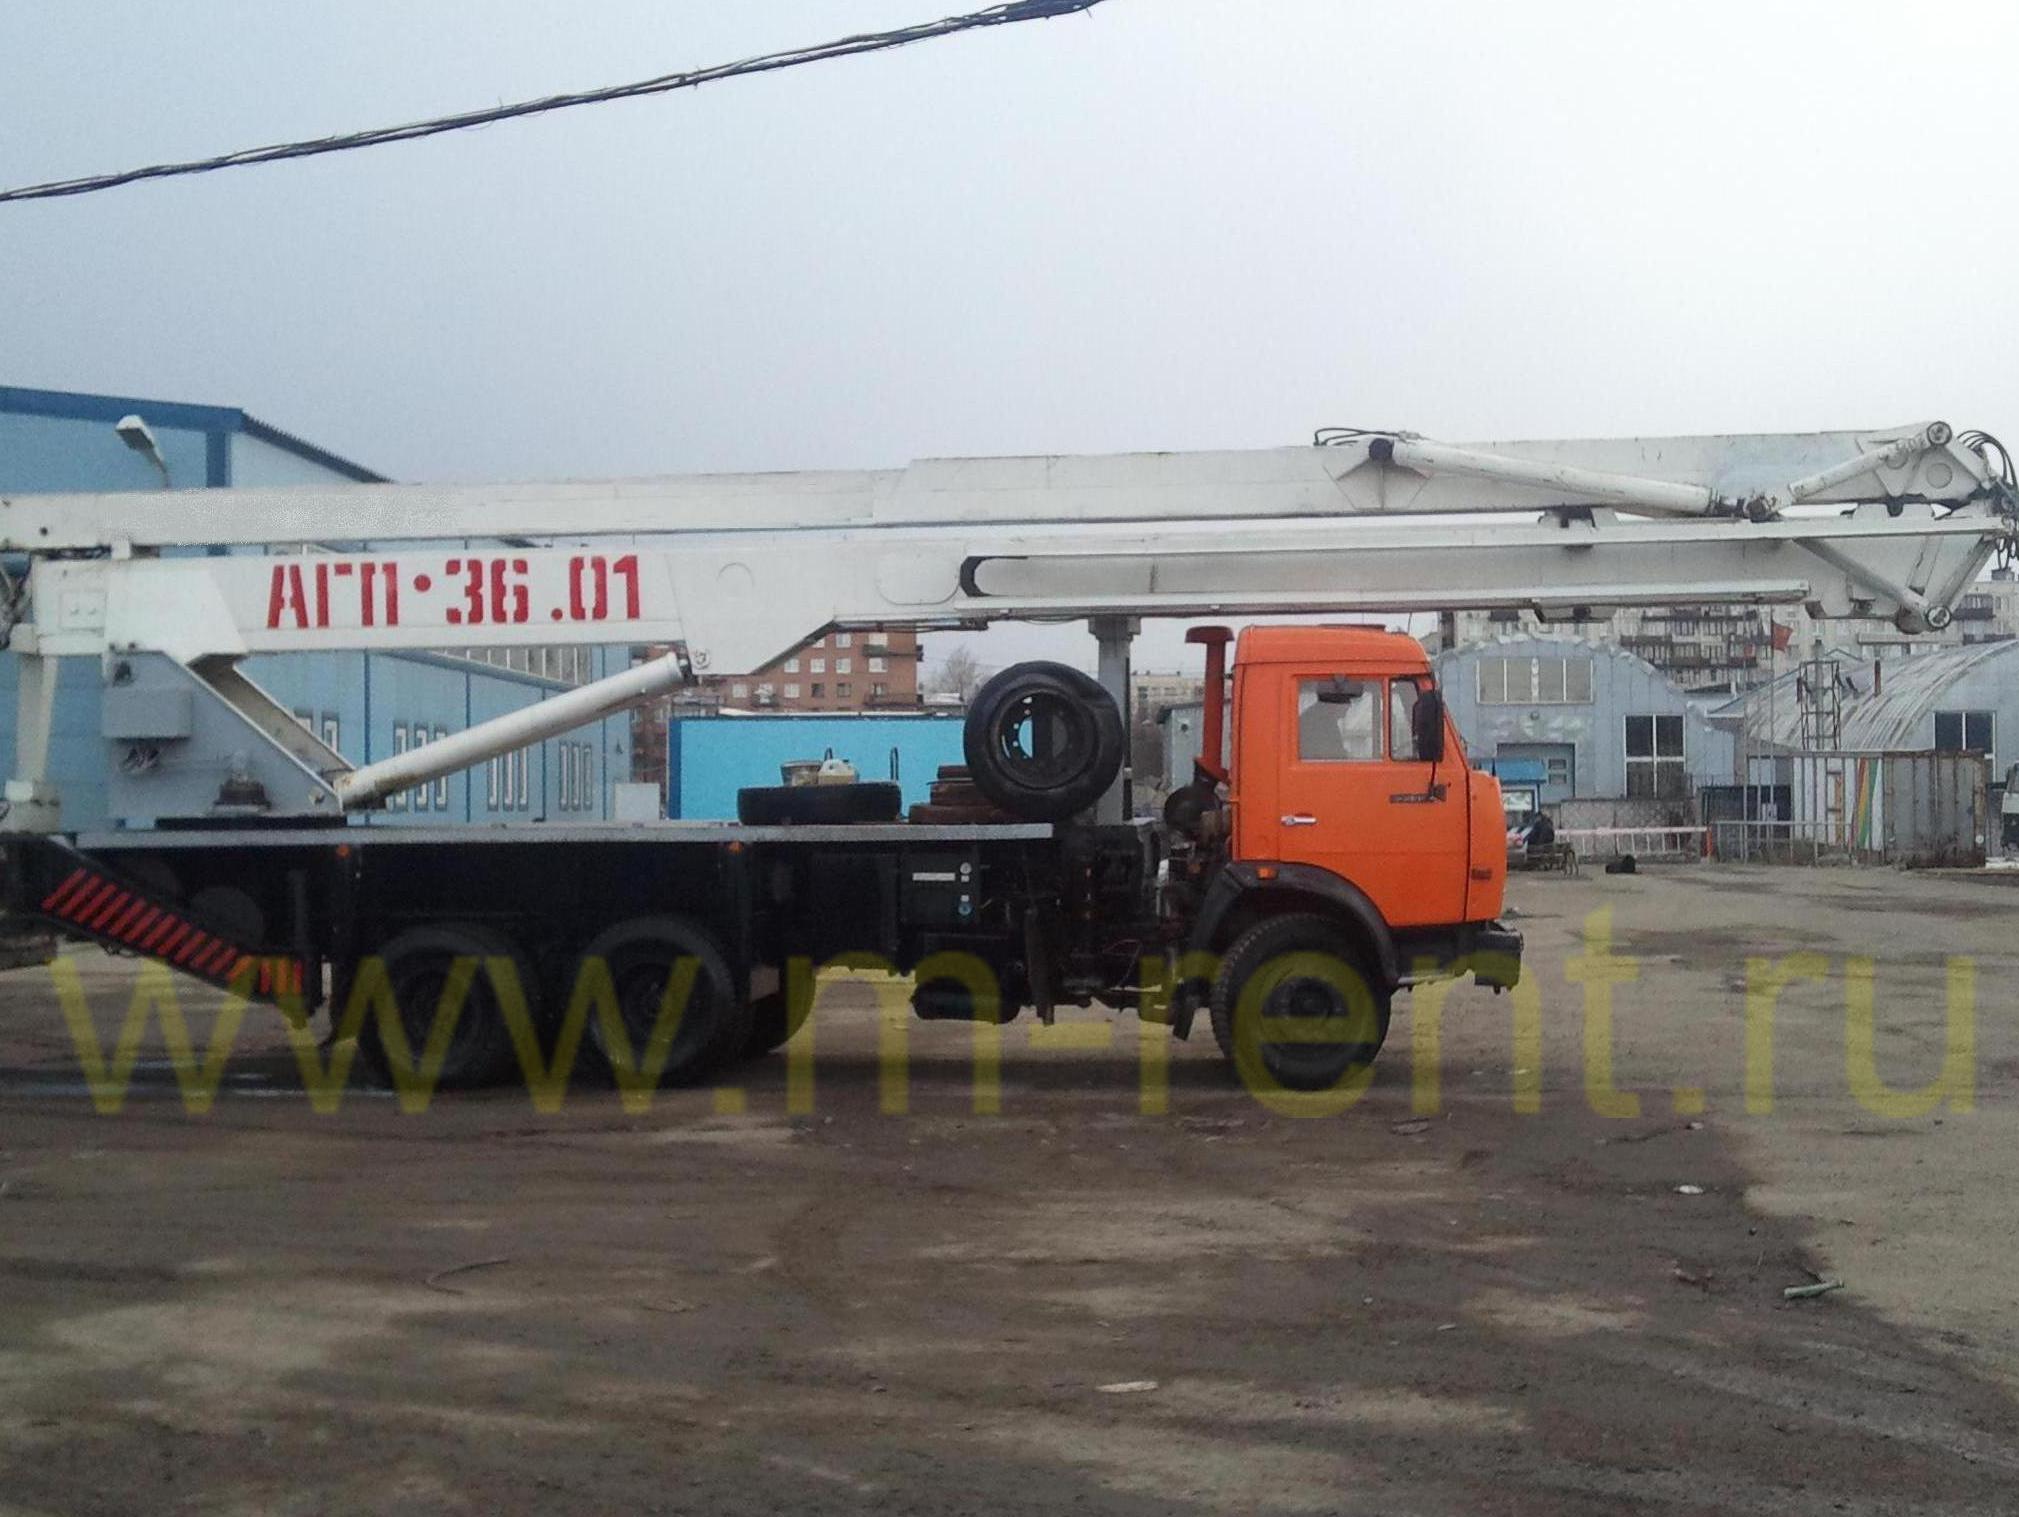 аренда автовышки АГП-36, ПСС-141.36 36 метров